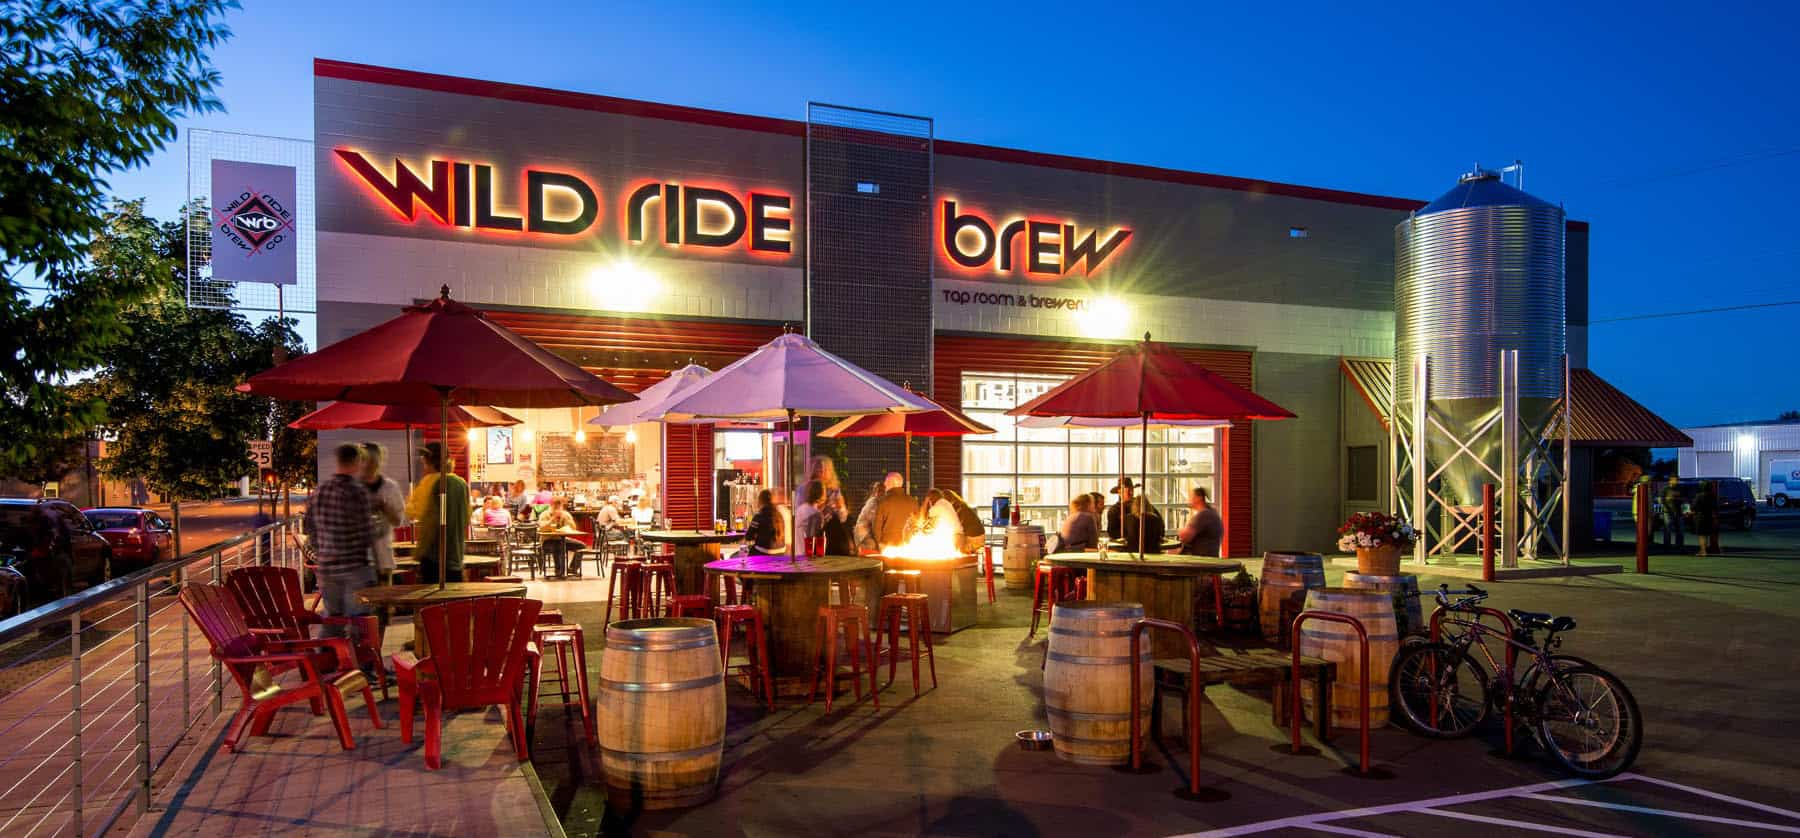 Wild Ride Brewing Company